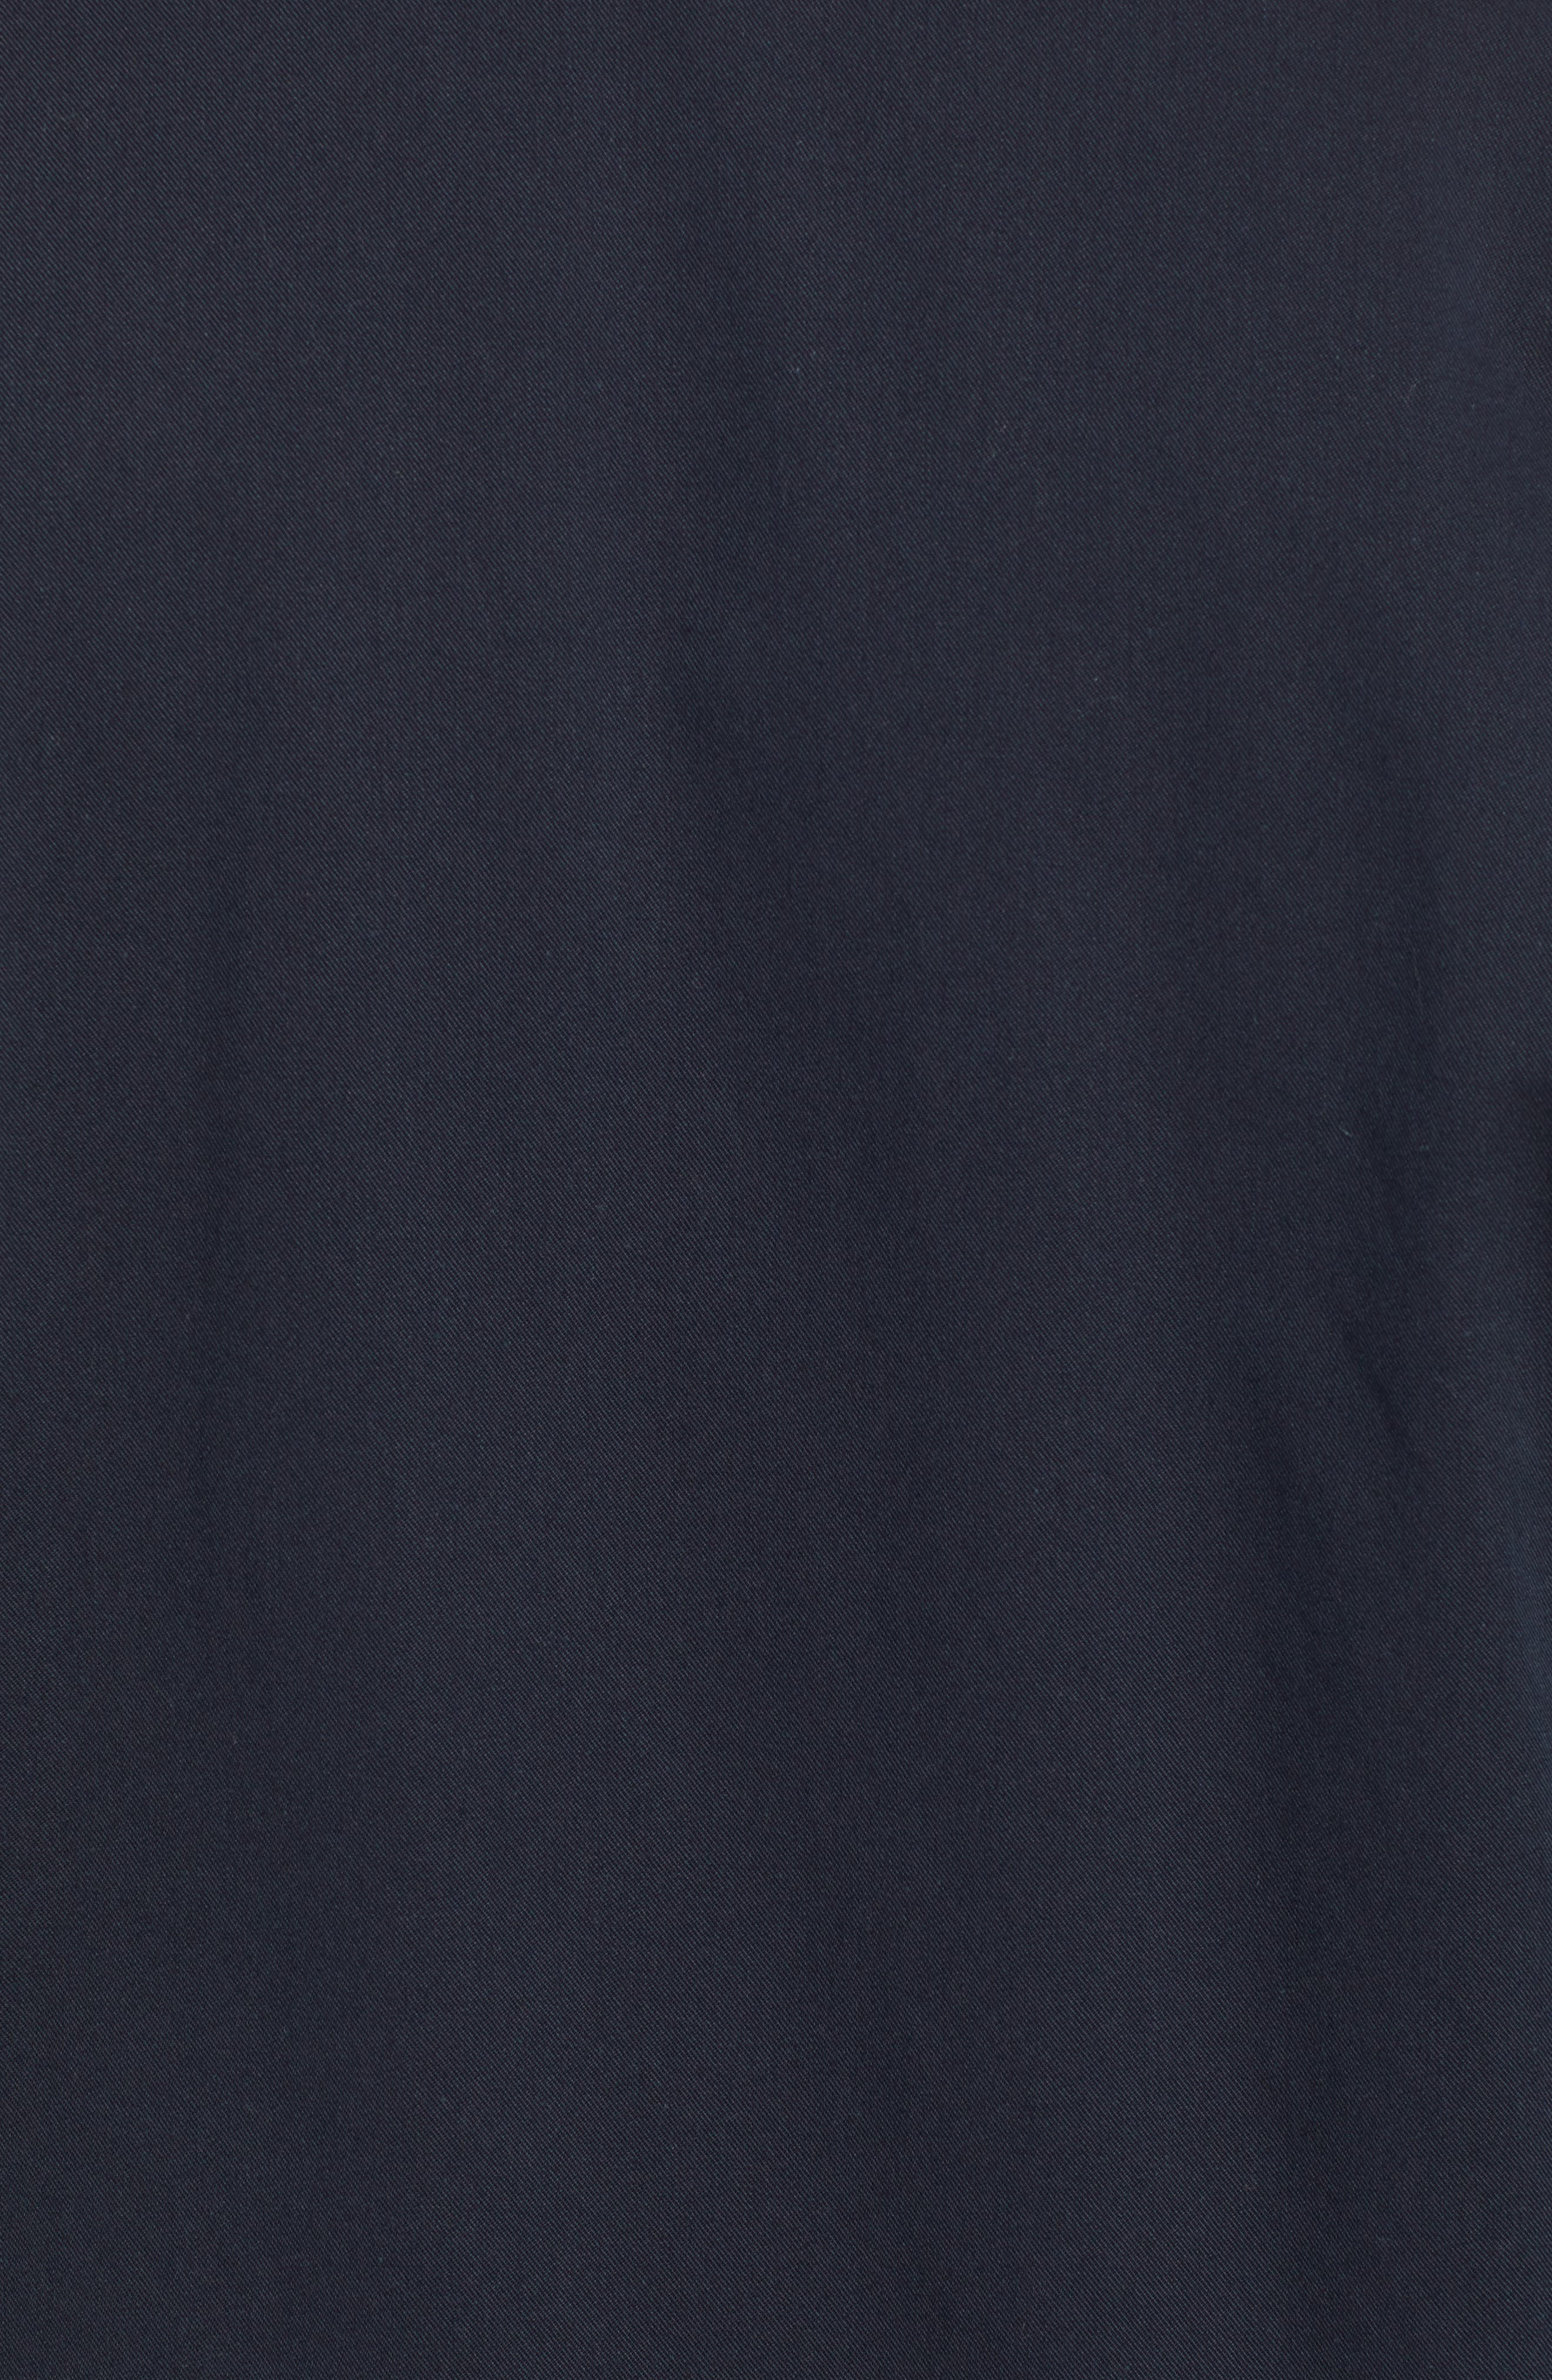 Axle Shop Regular Stretch Cotton Blend Jacket,                             Alternate thumbnail 7, color,                             BLUE VAULT/ BLACK